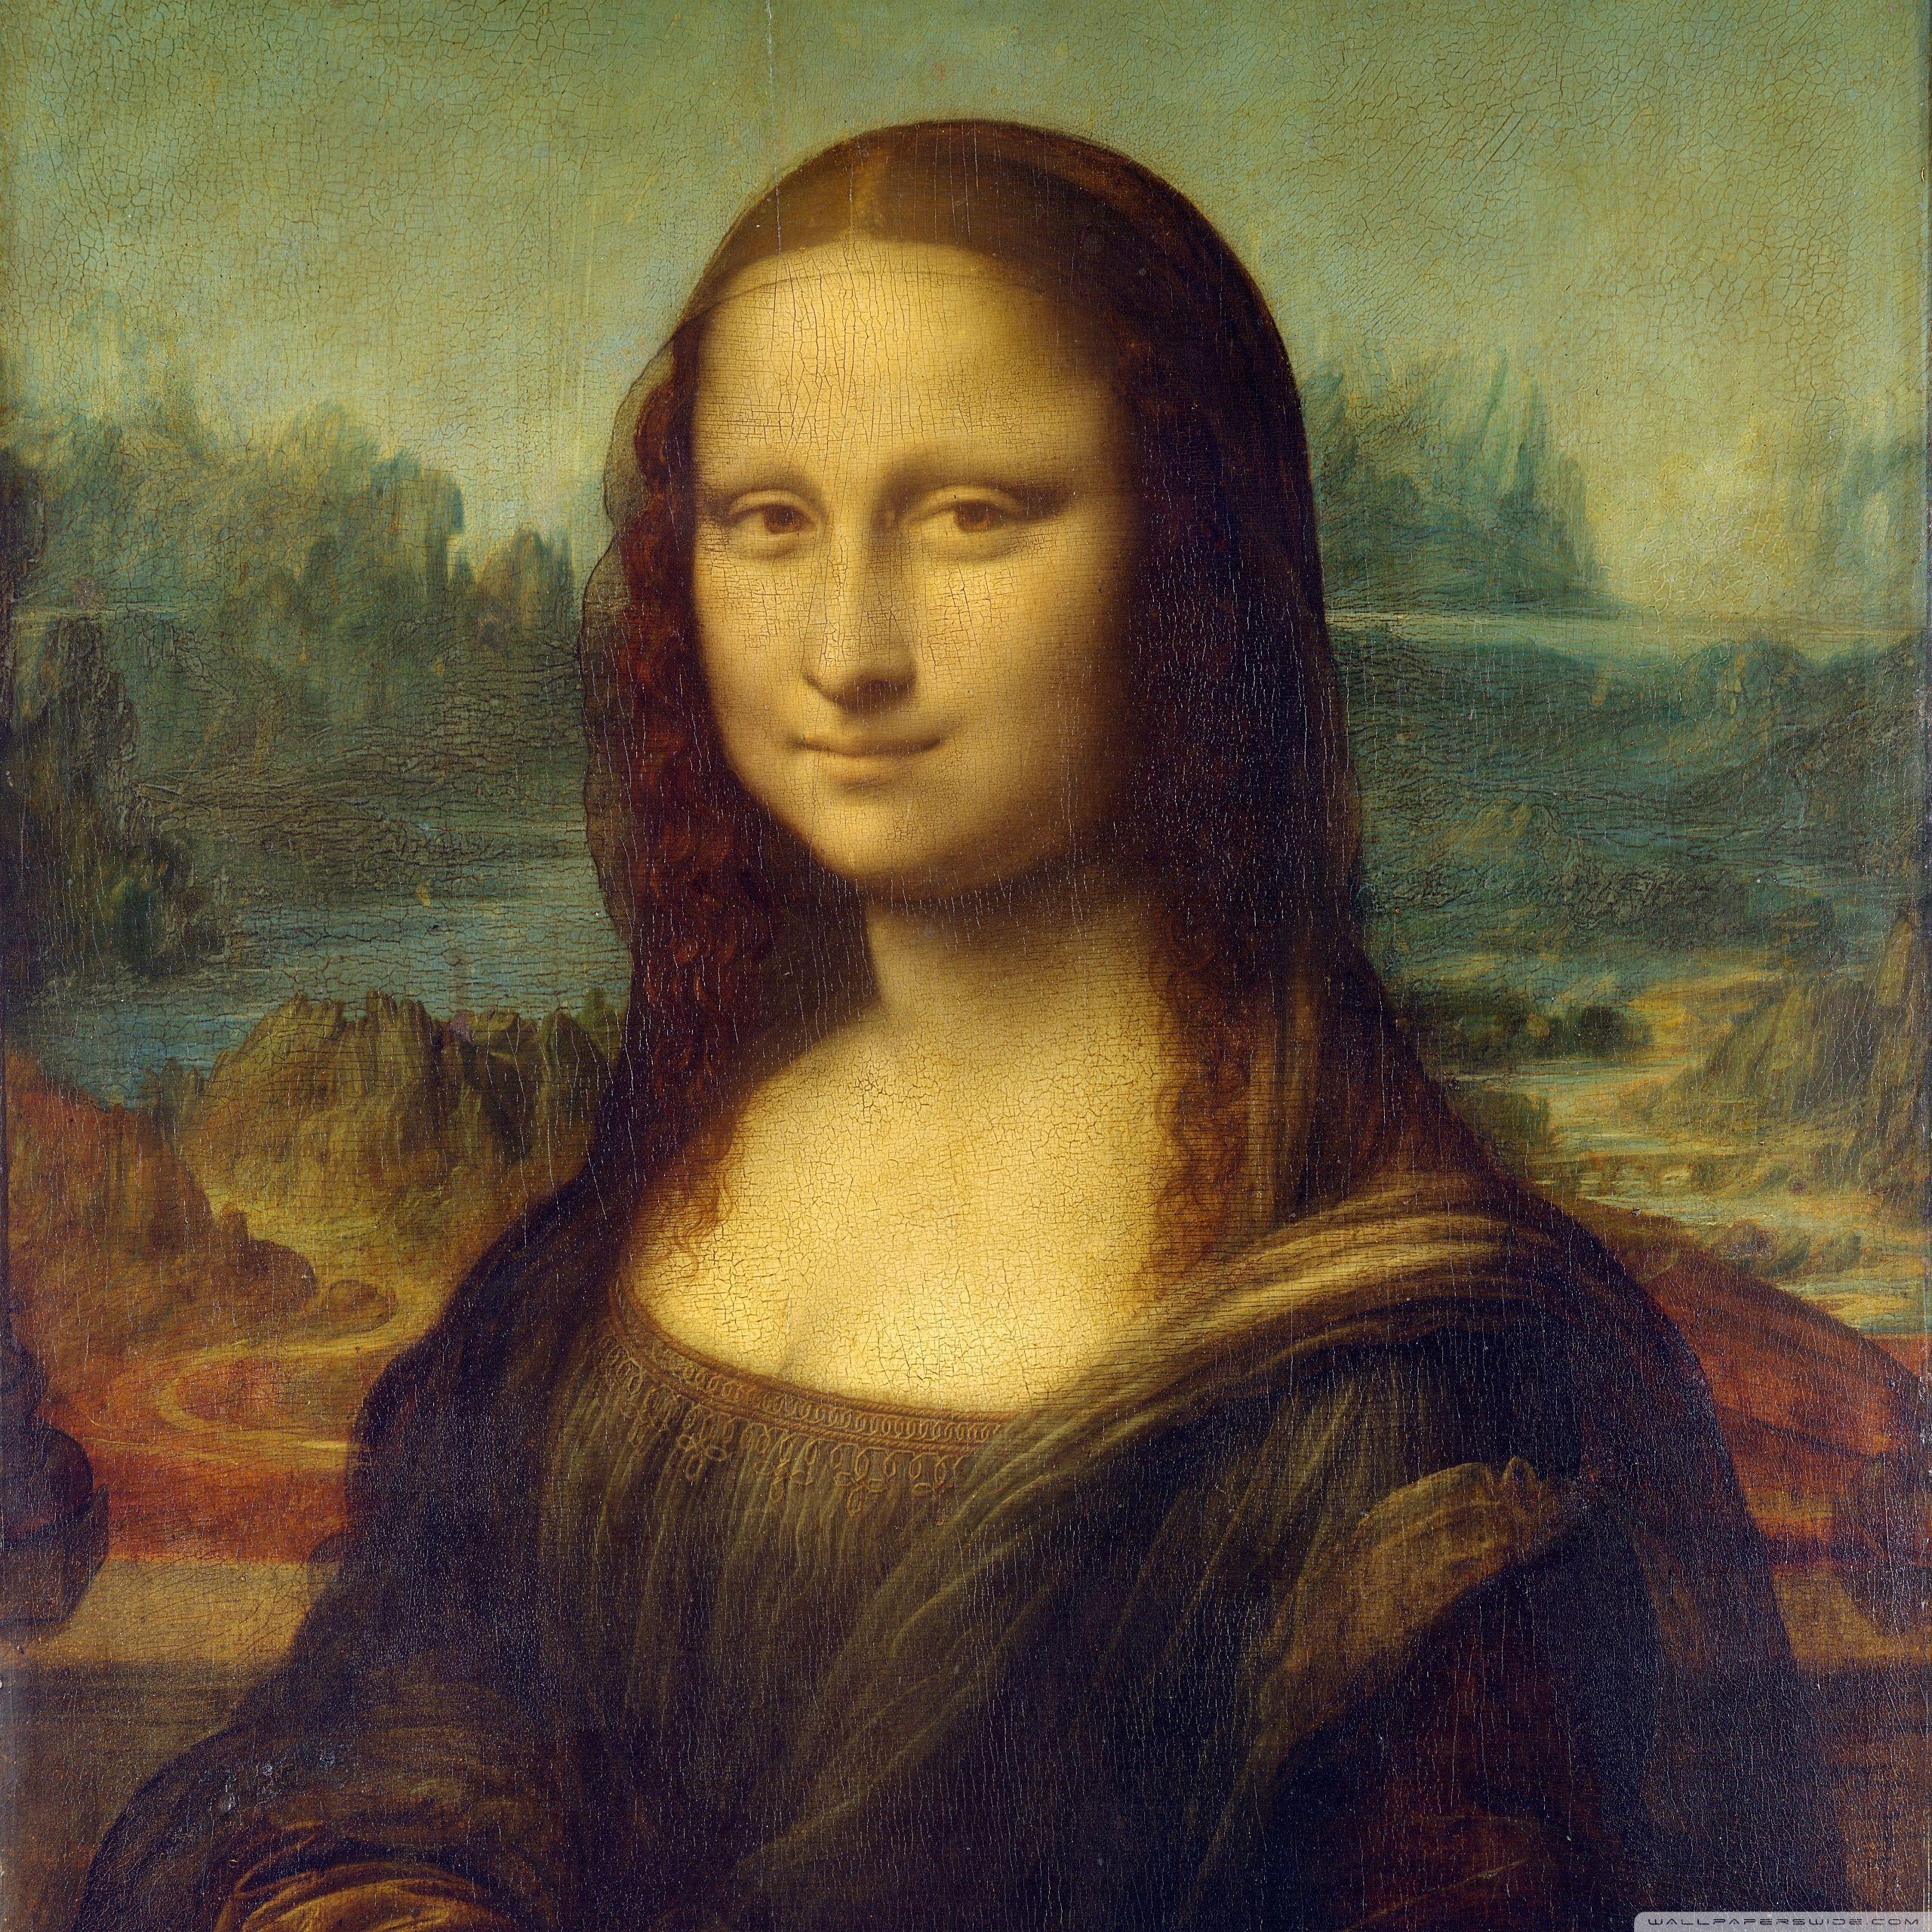 Mona Lisa Wallpapers Top Free Mona Lisa Backgrounds